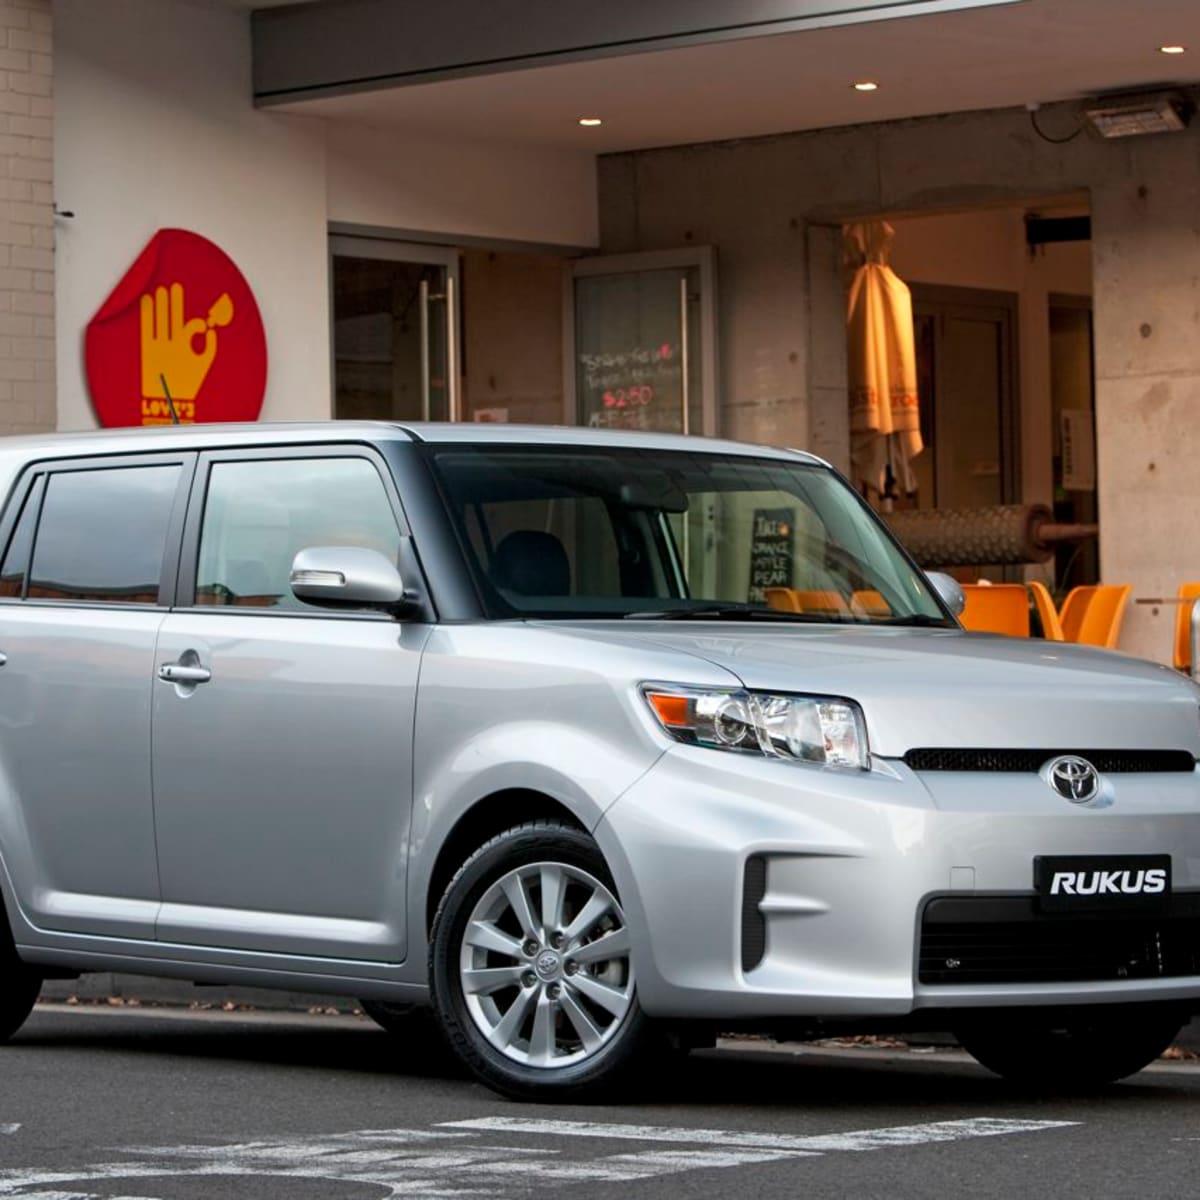 Toyota Rukus vs KIA Soul | CarAdvice